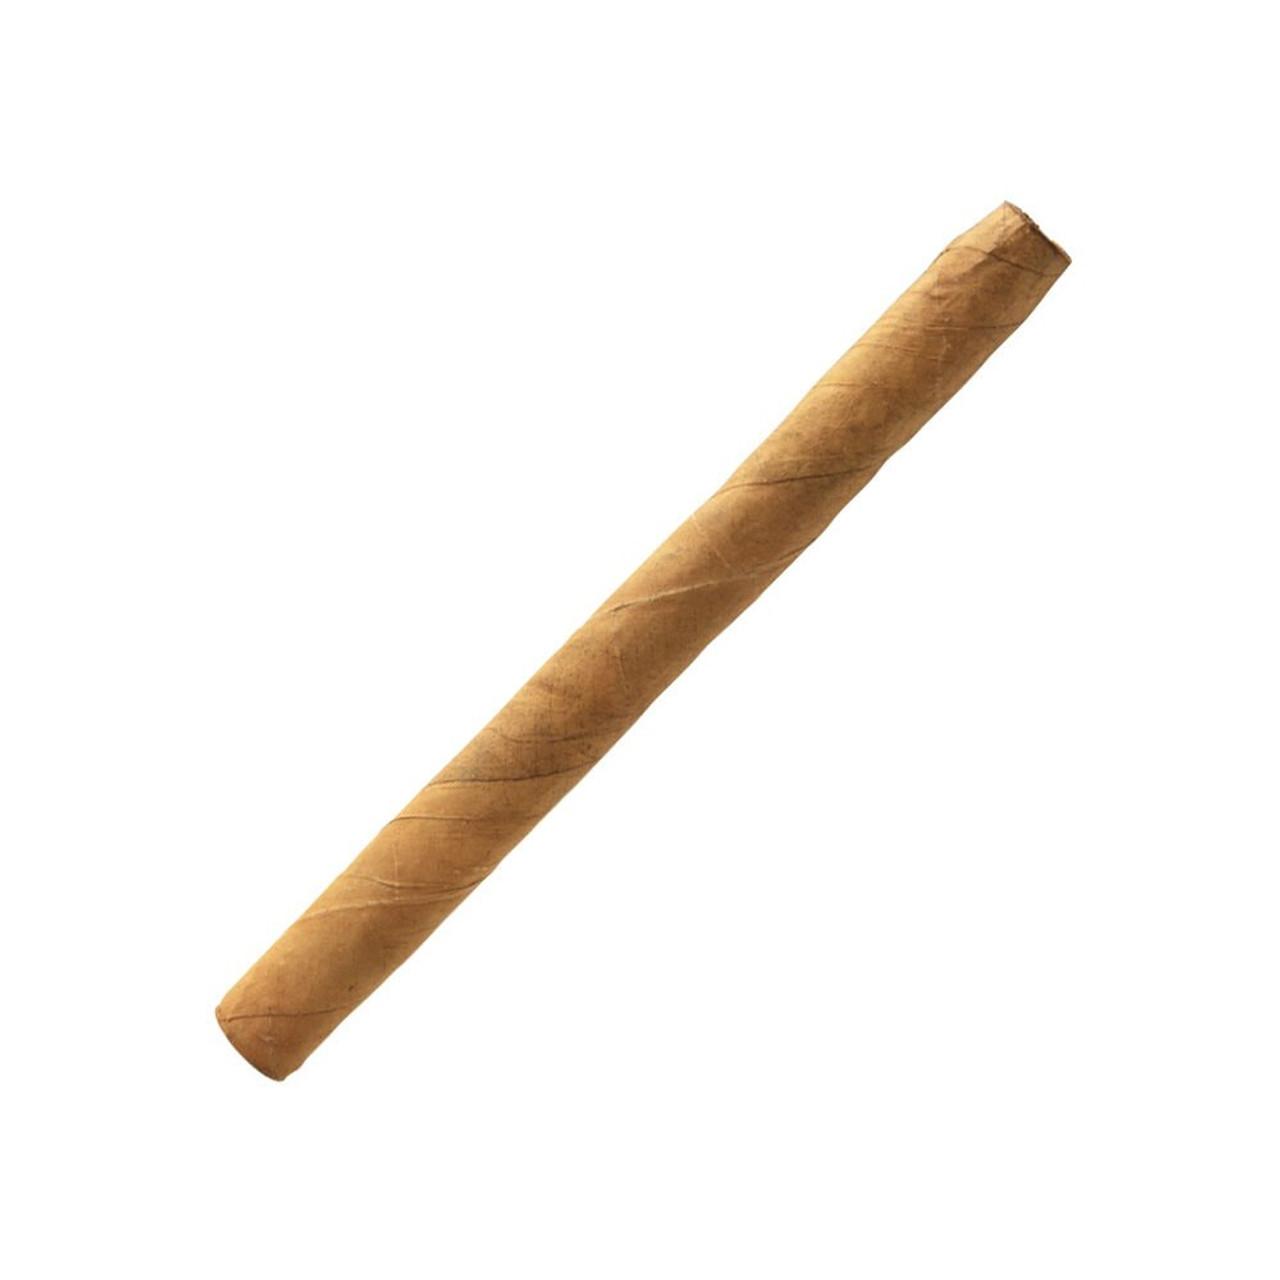 Agio Mehari's Cigarillos Ecuador Cigars - 4 x 23 (Box of 50)